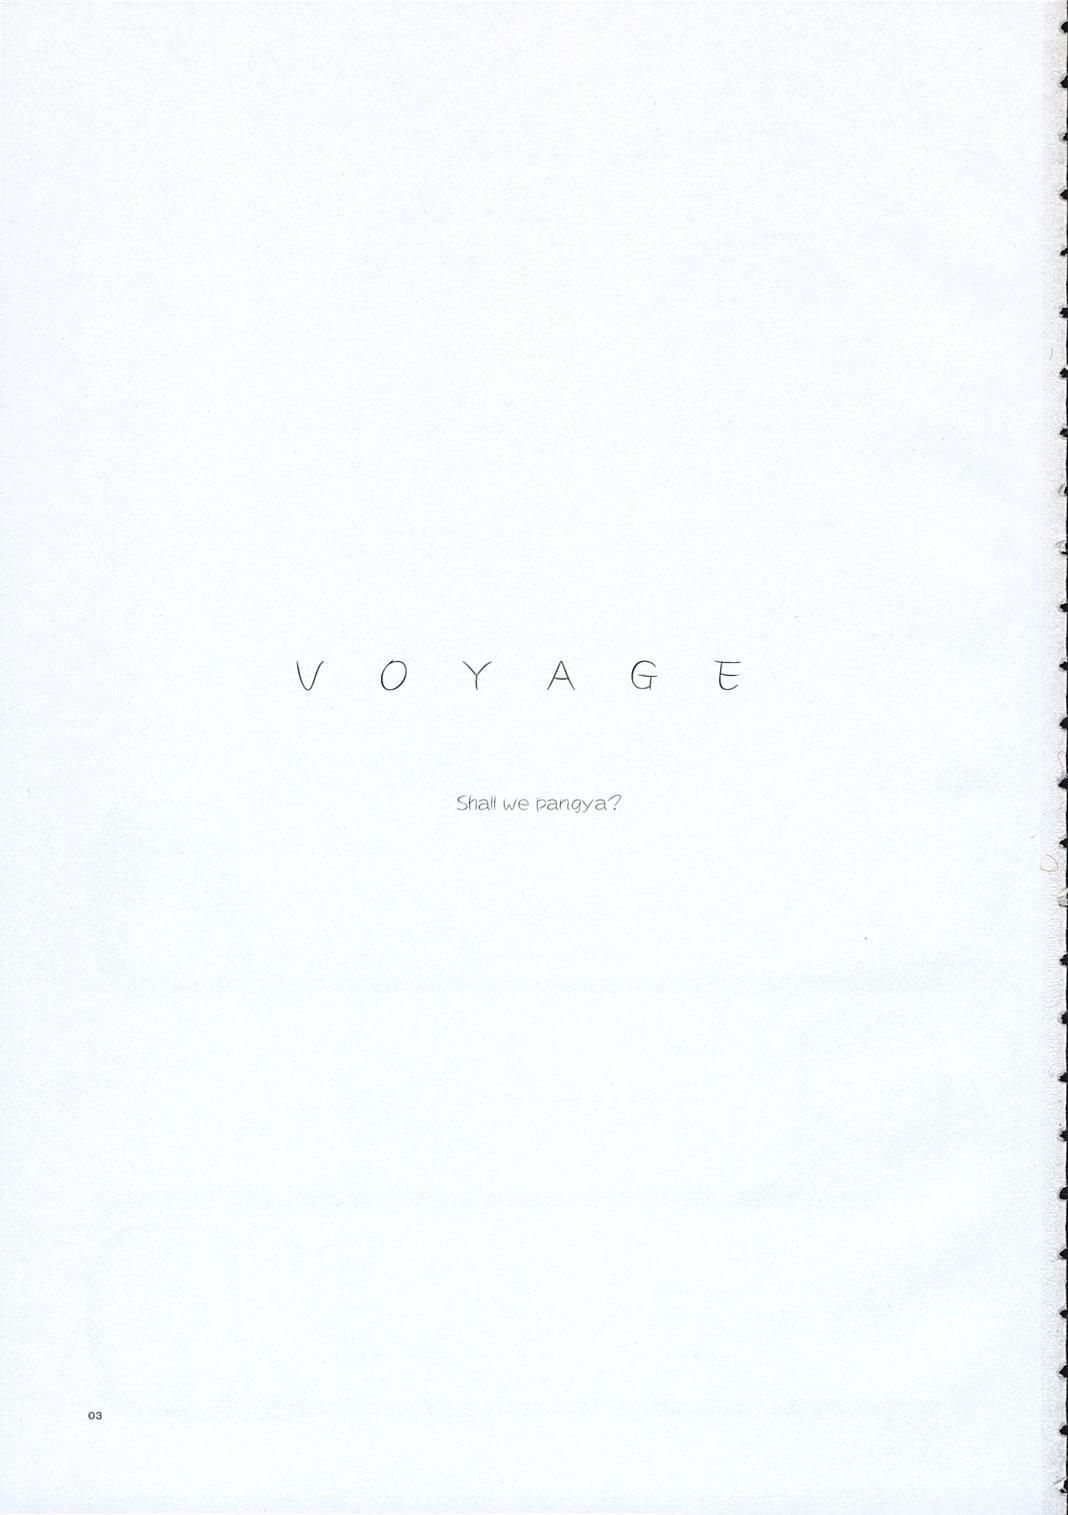 Minatekishugi] Voyage 1